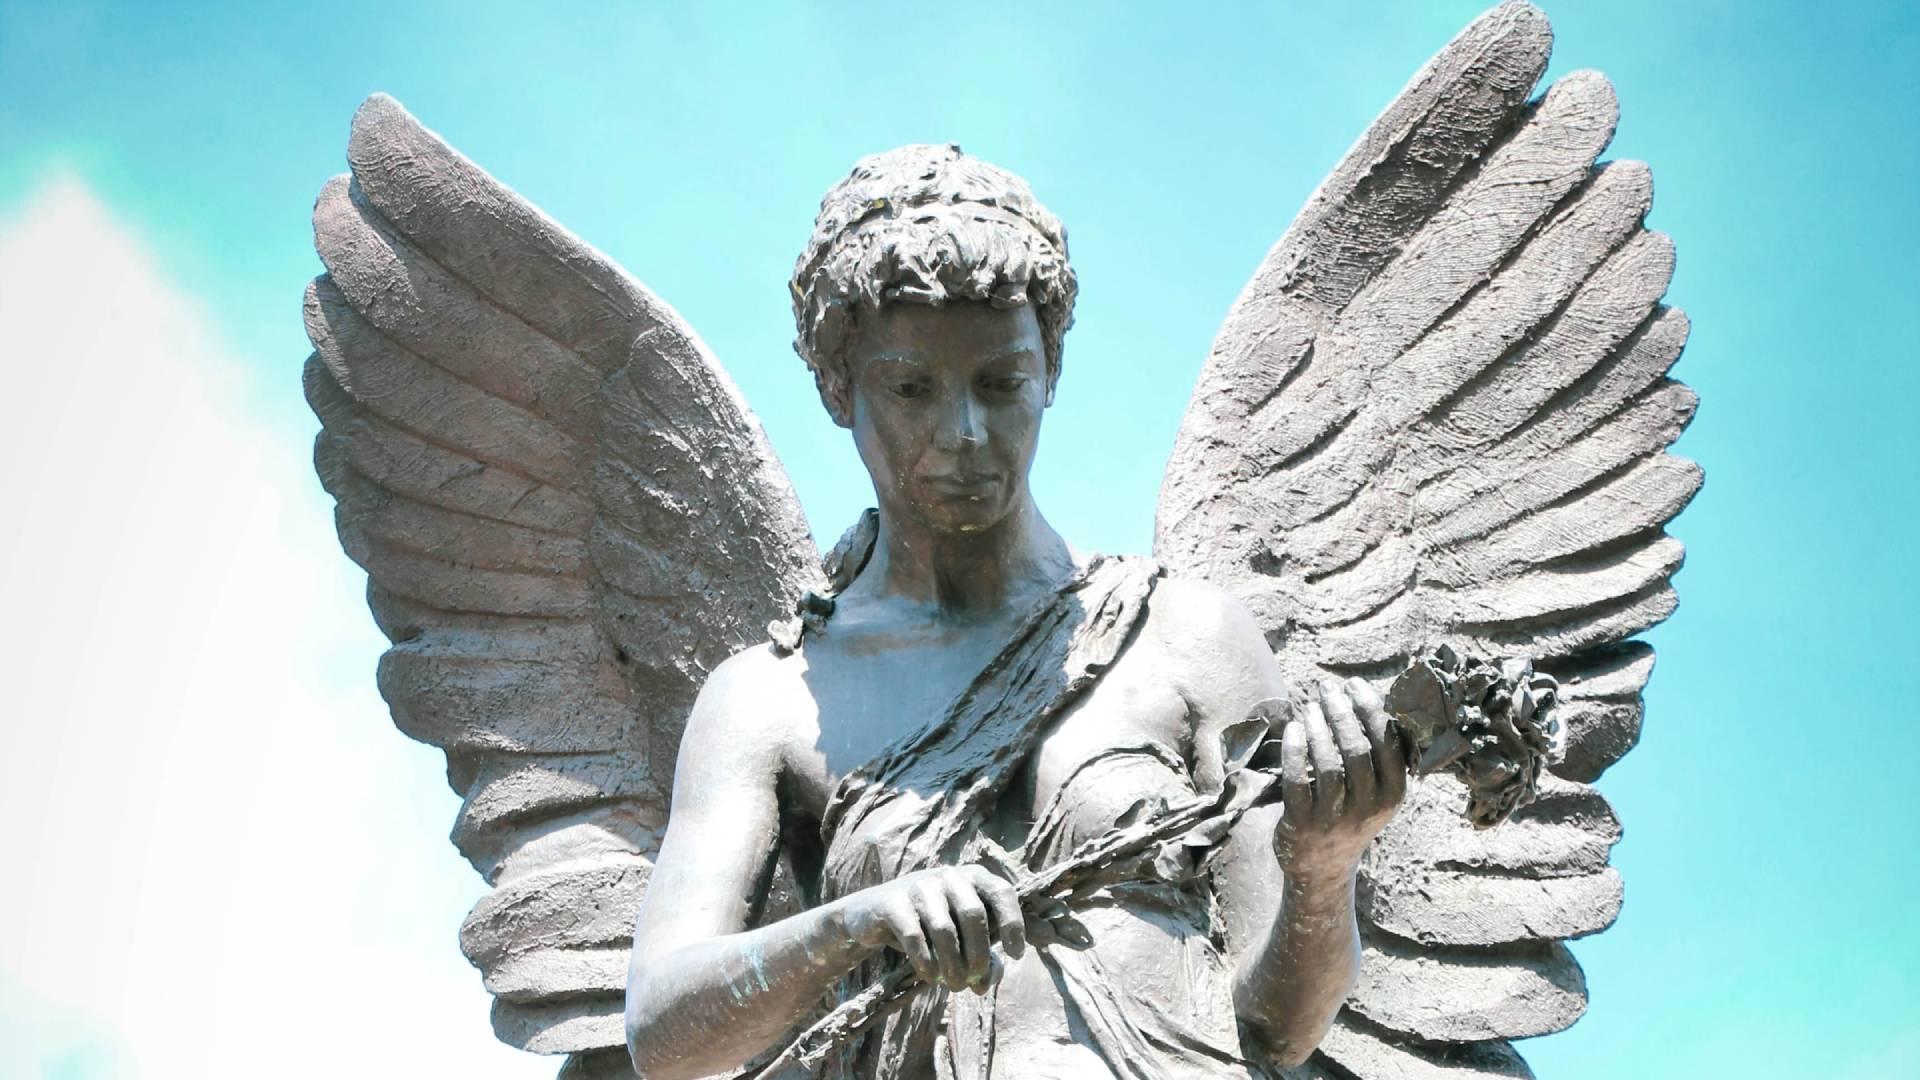 angyal szobor